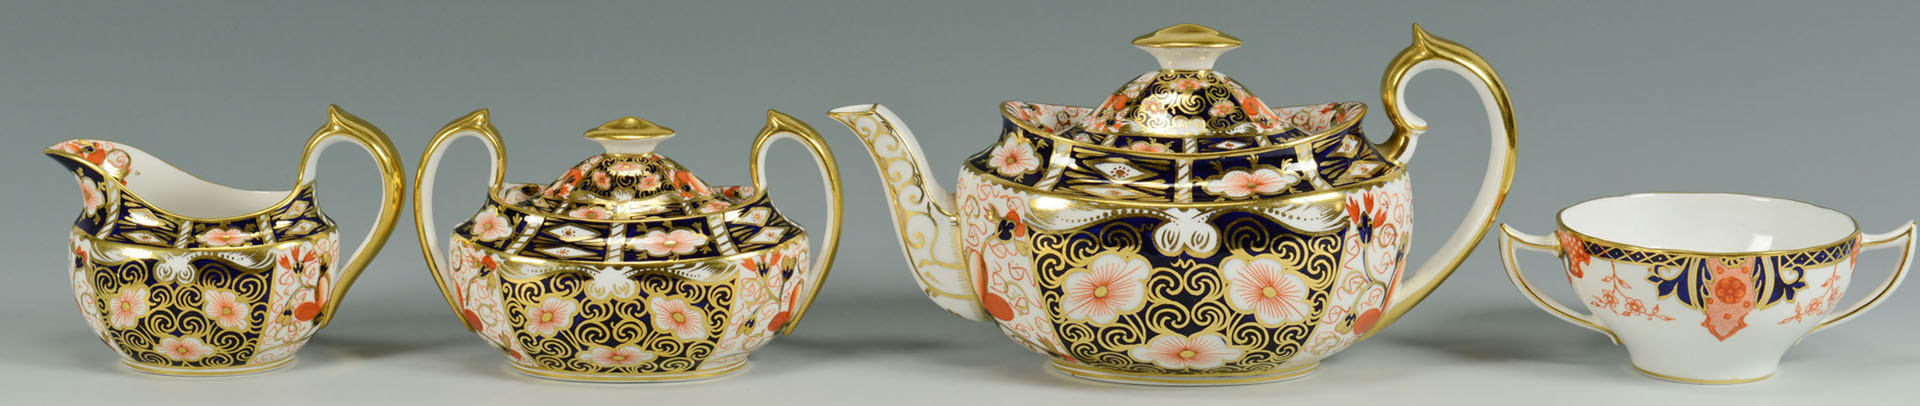 Lot 568: Royal Crown Derby Imari Tea Set